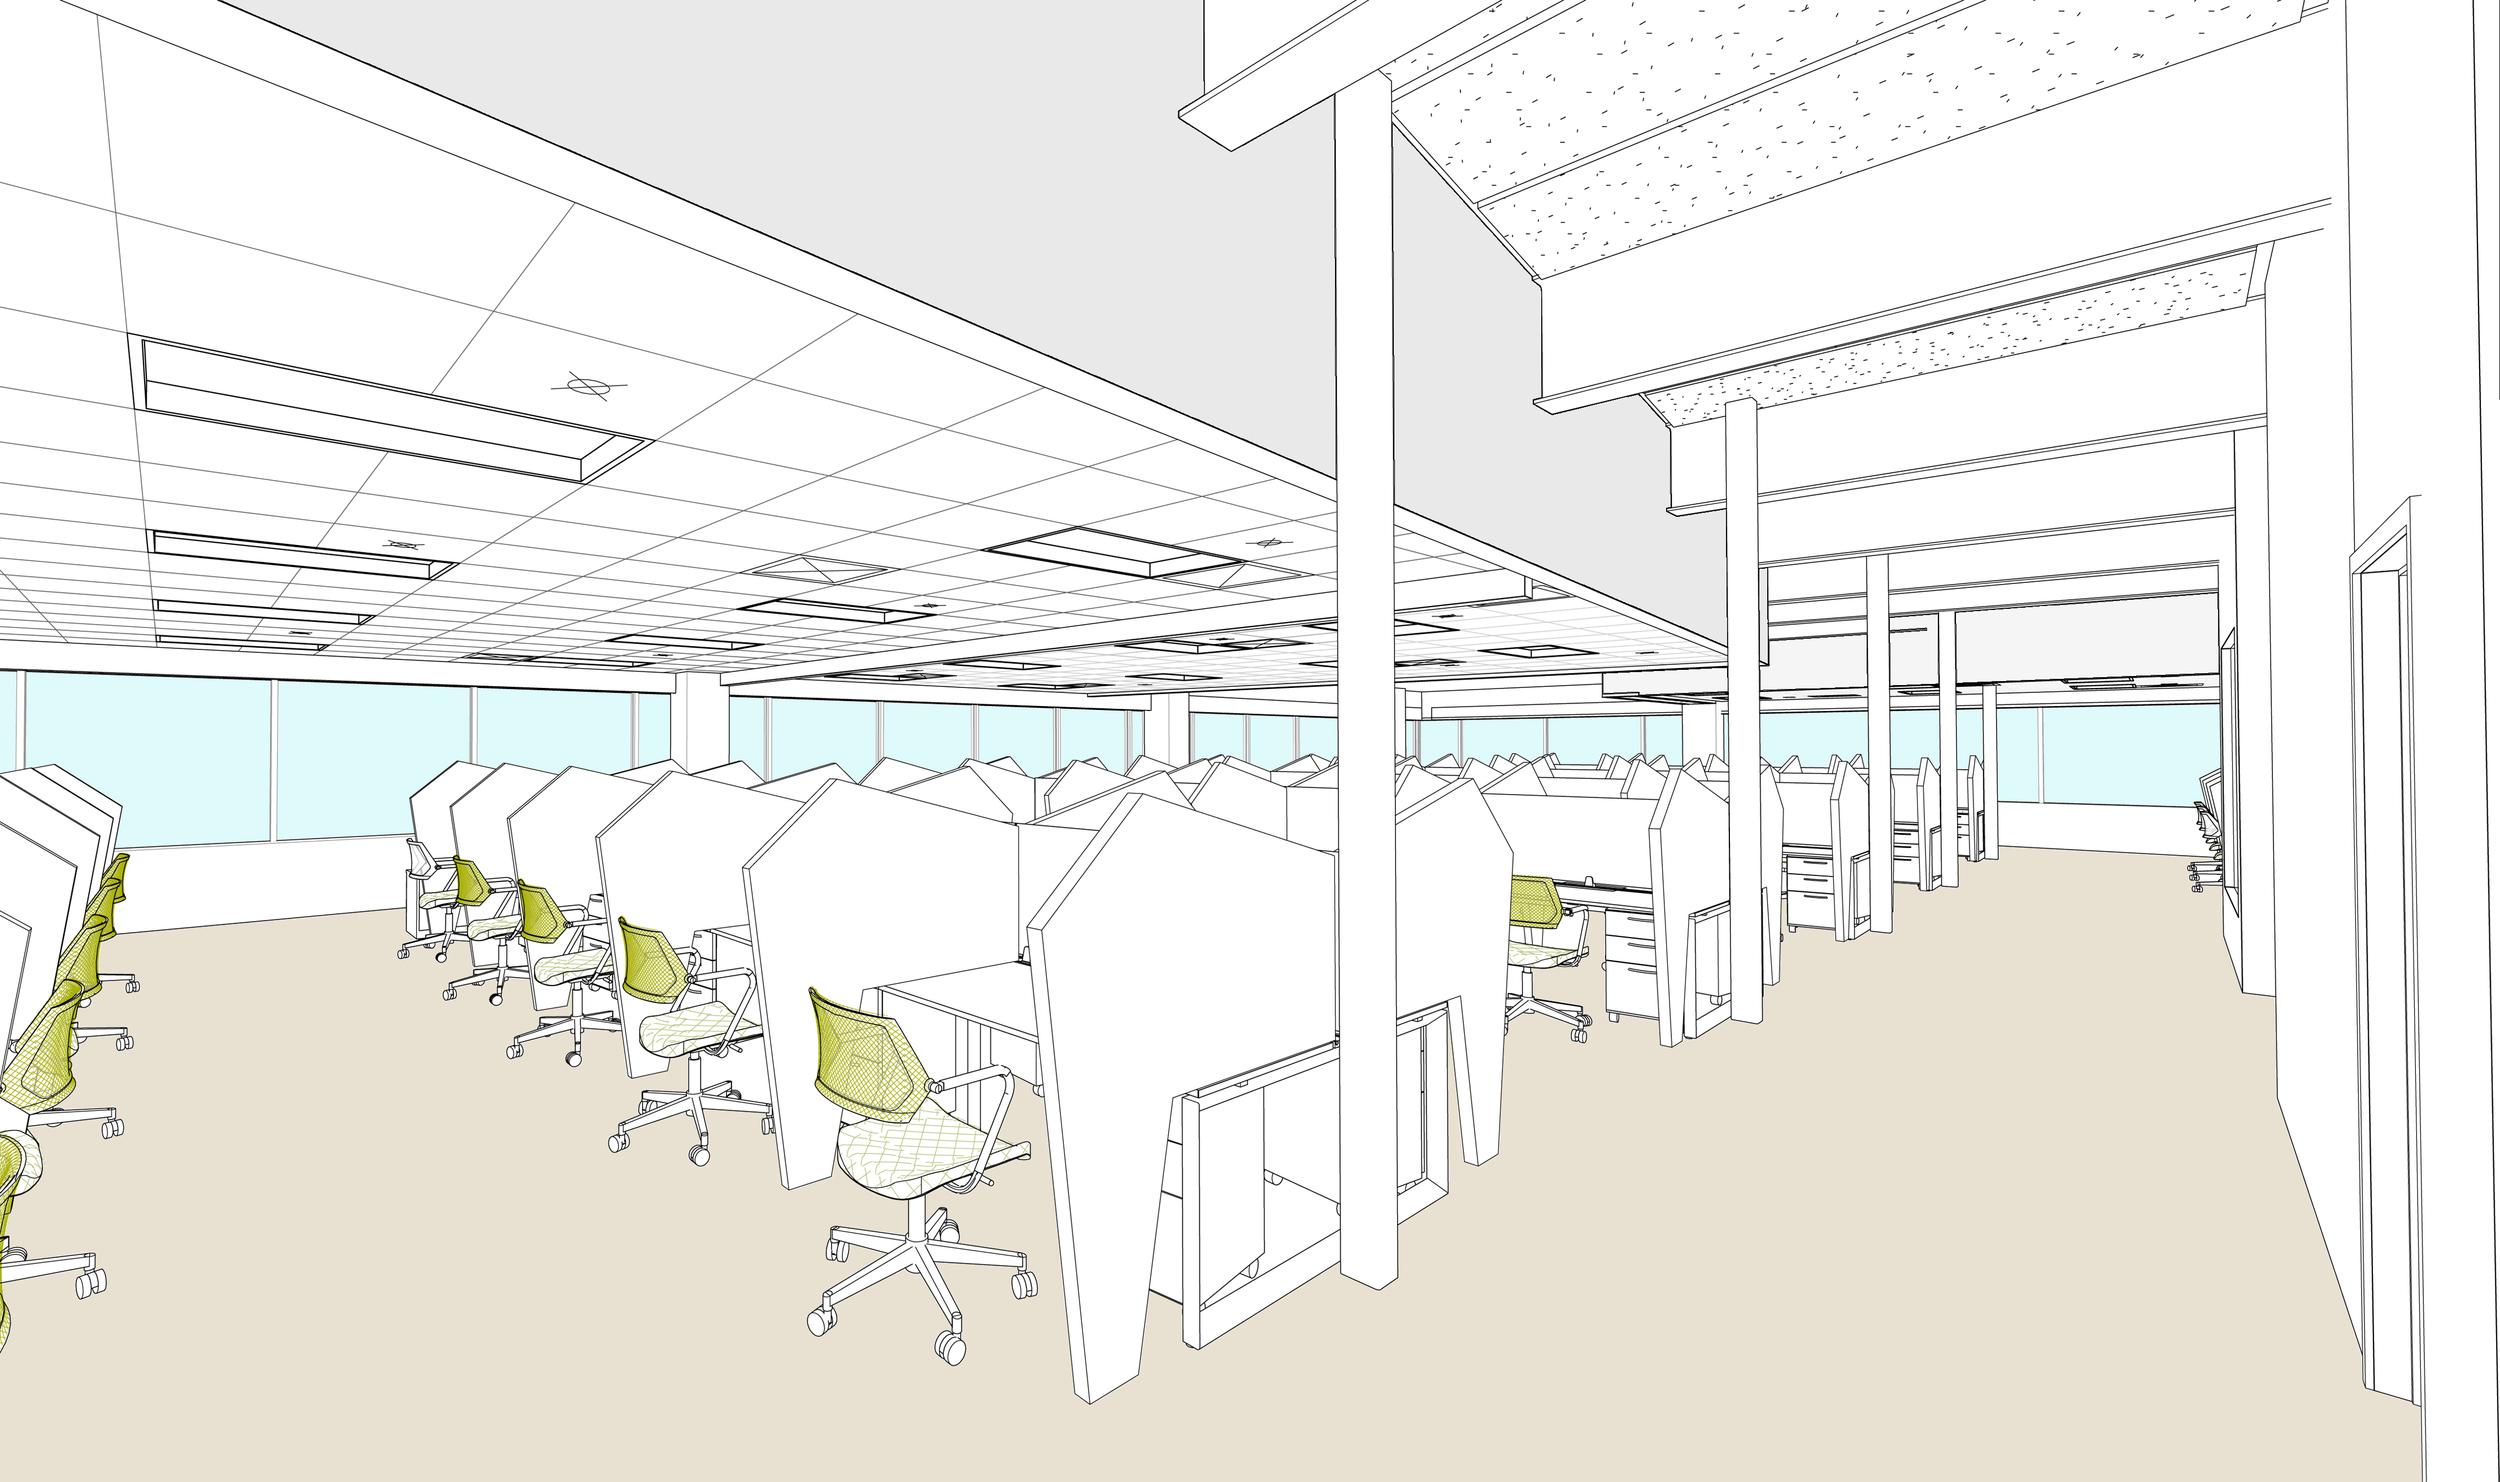 Concept Design for the Customer Care area -